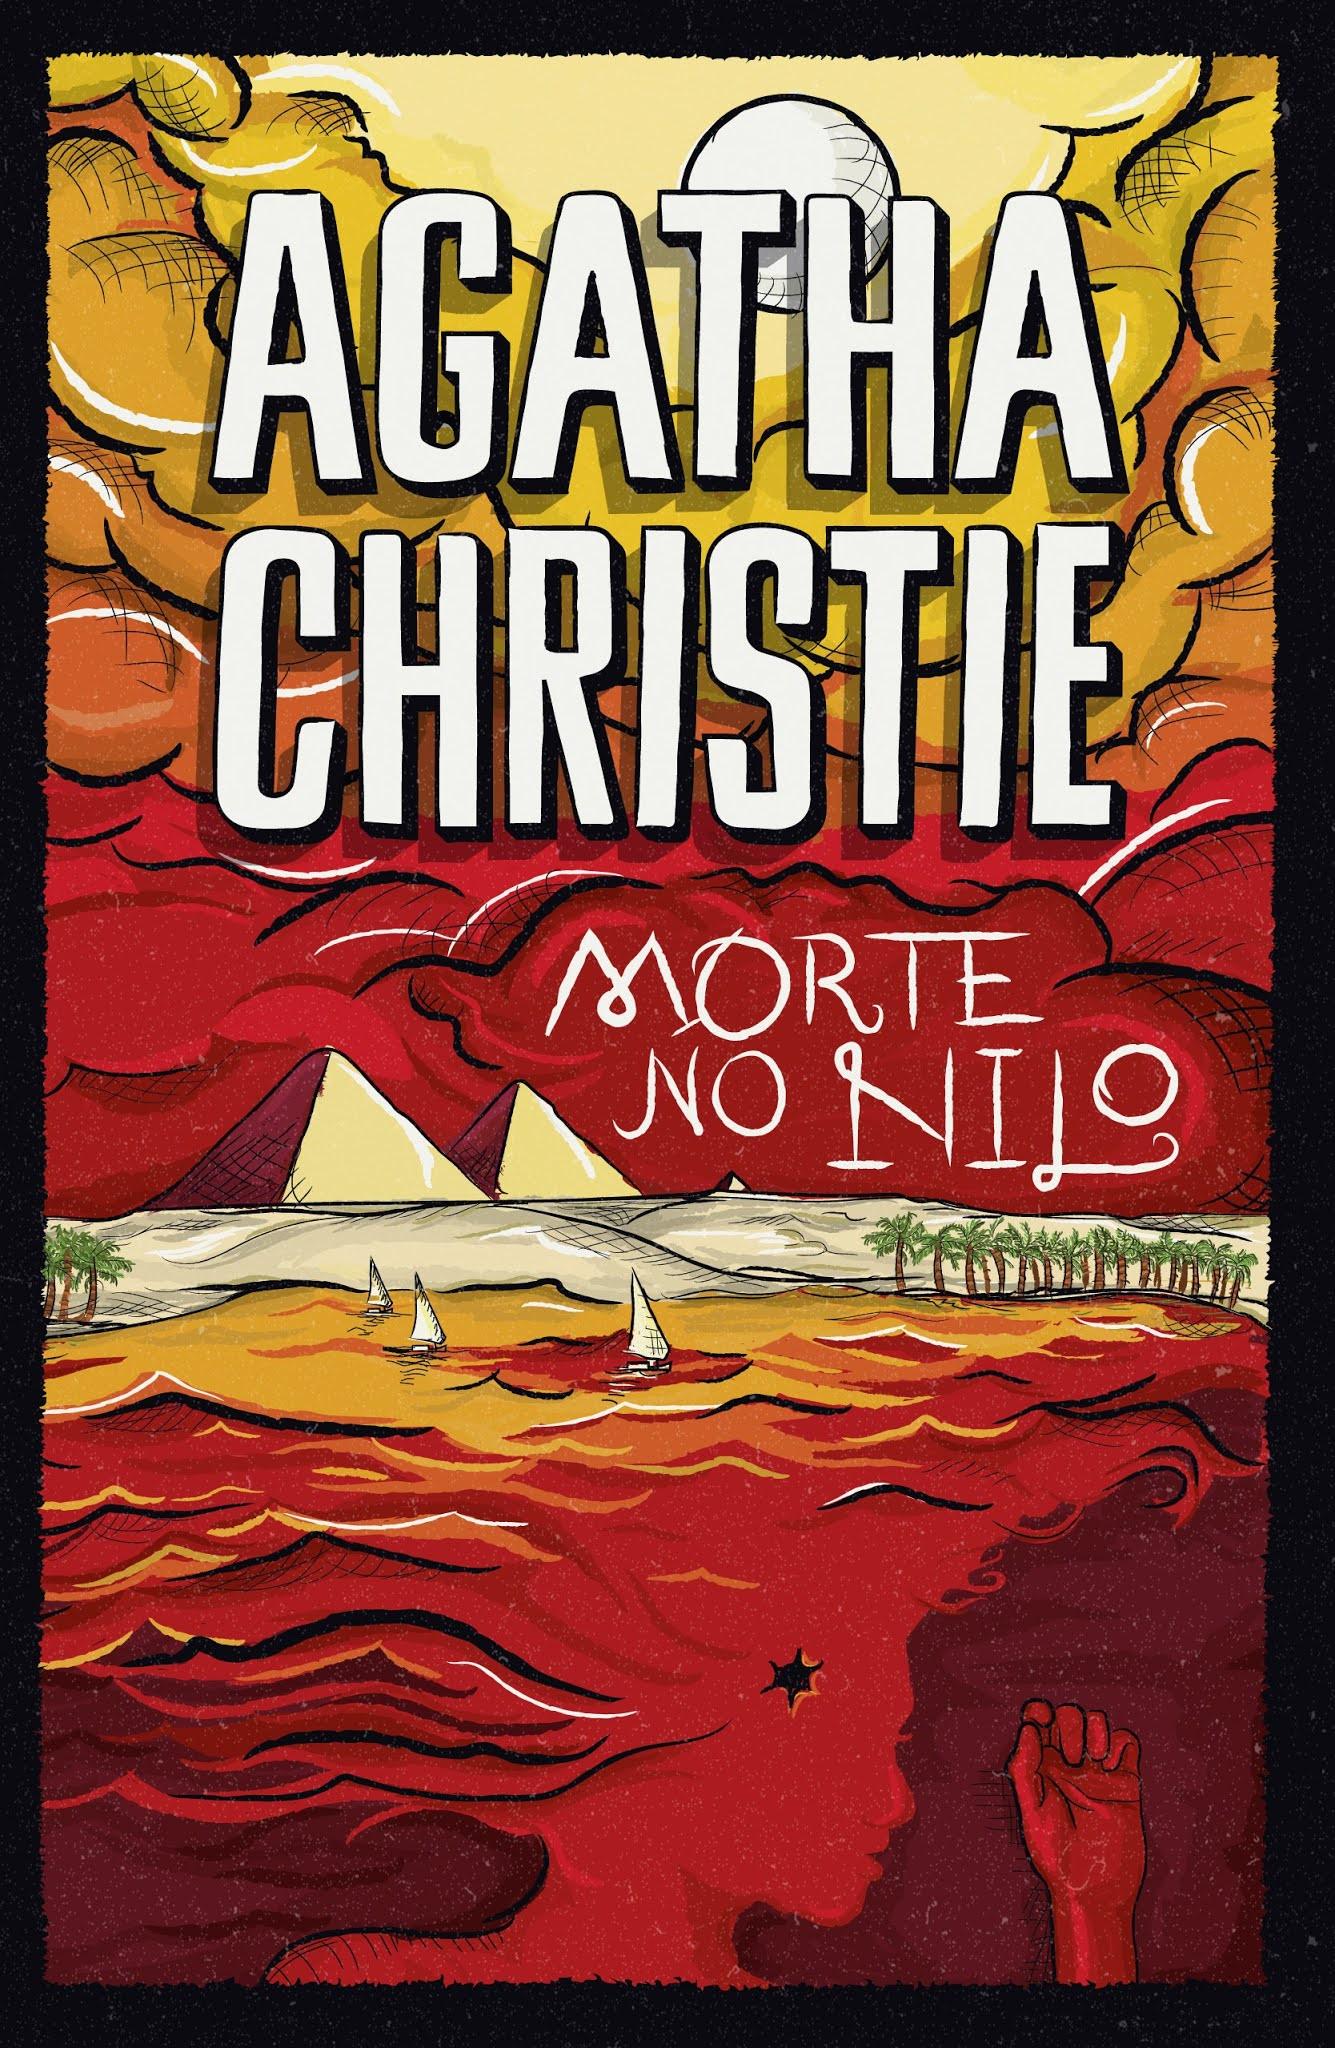 Morte no Nilo | Agatha Christie